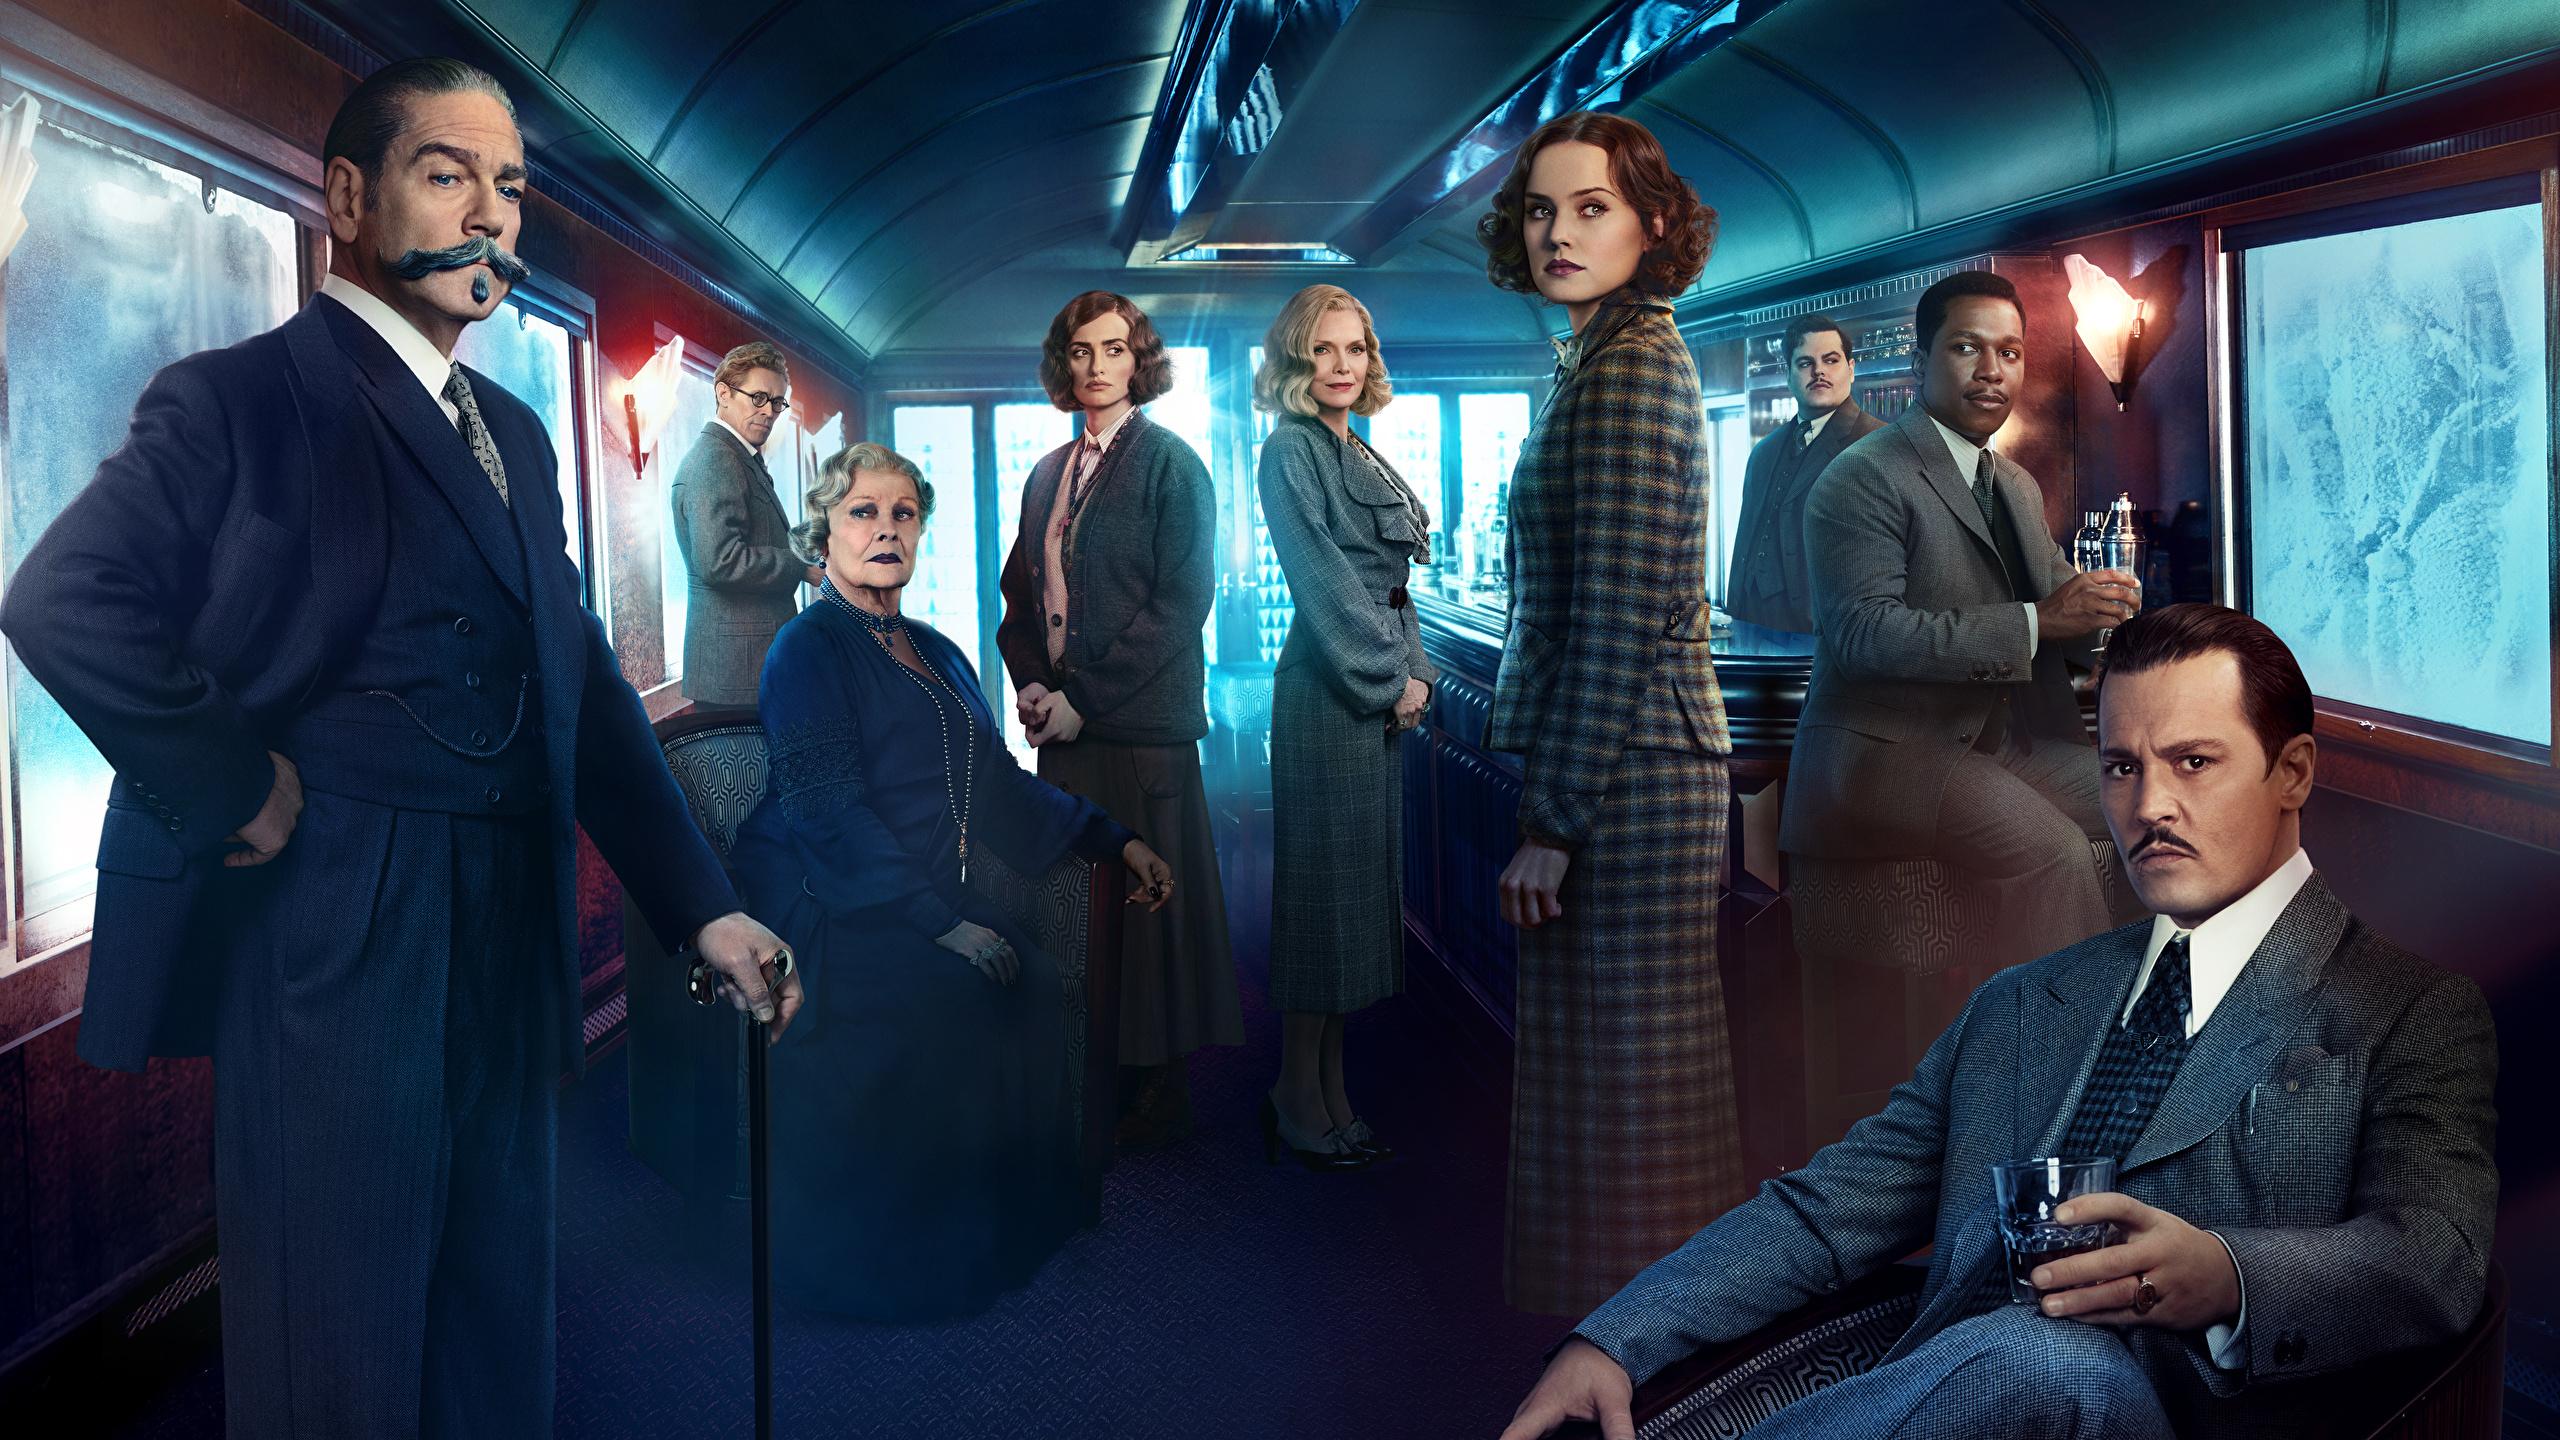 Image Murder On The Orient Express 2017 Men Kenneth 2560x1440